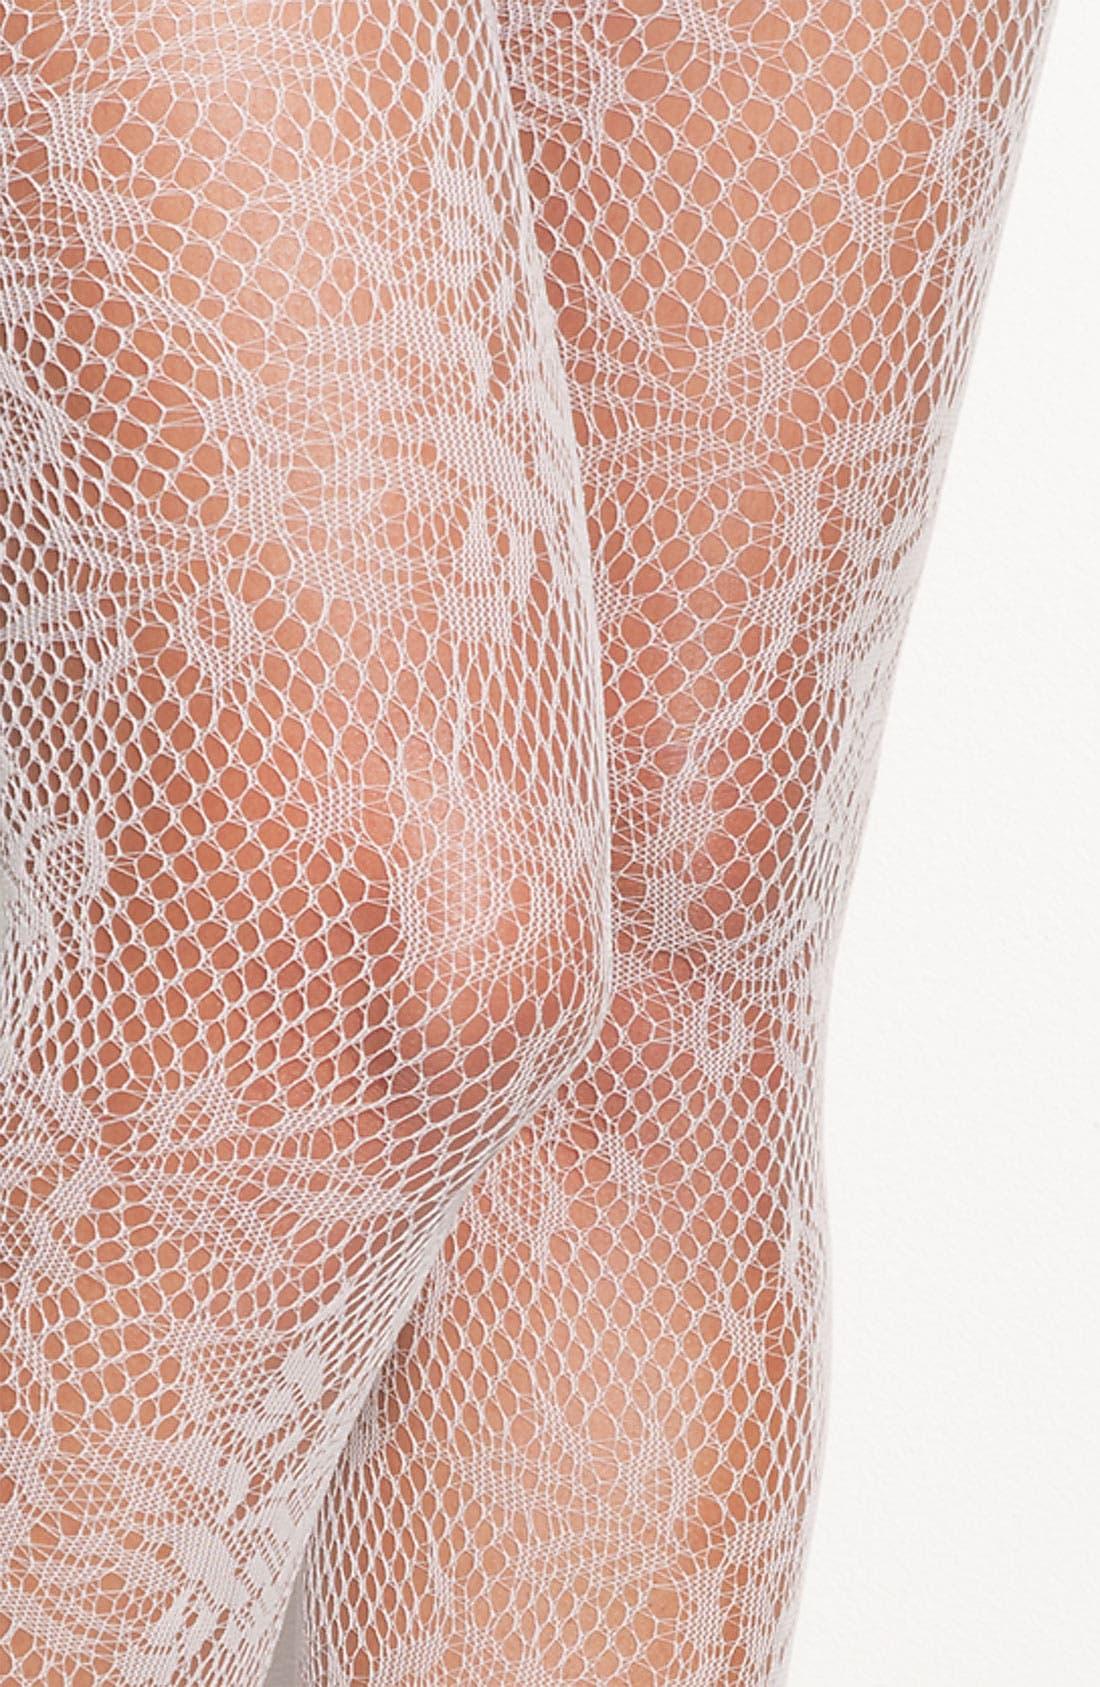 Alternate Image 2  - Hue 'Rose Floral' Fishnet Stockings (2 for $22)